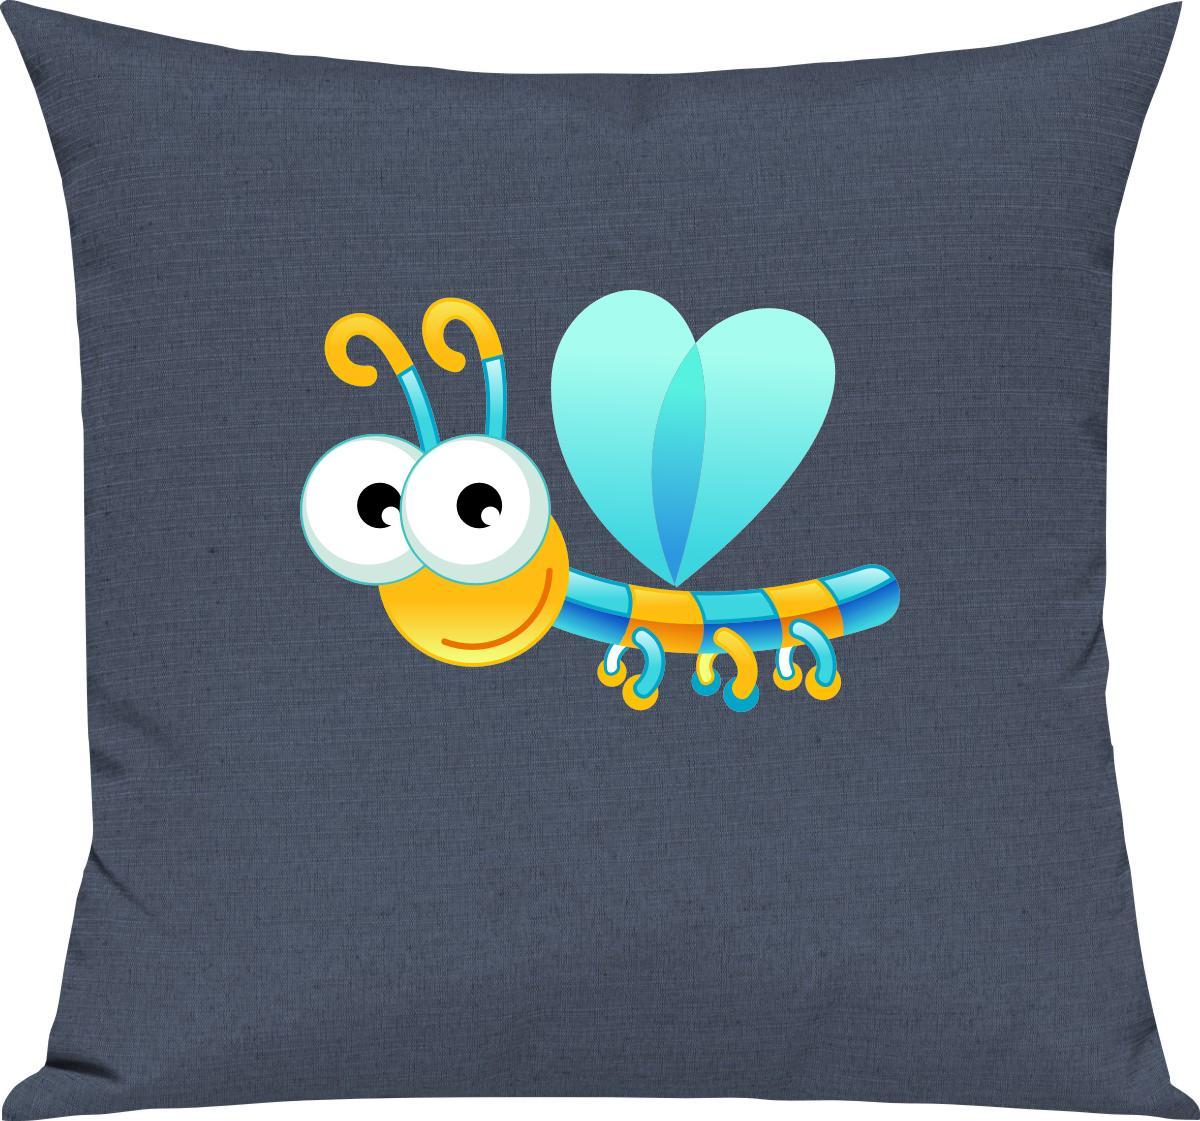 Indexbild 2 - Kinder Kissen, Libelle Insekt Tiere Tier Natur, Kuschelkissen Couch Deko,